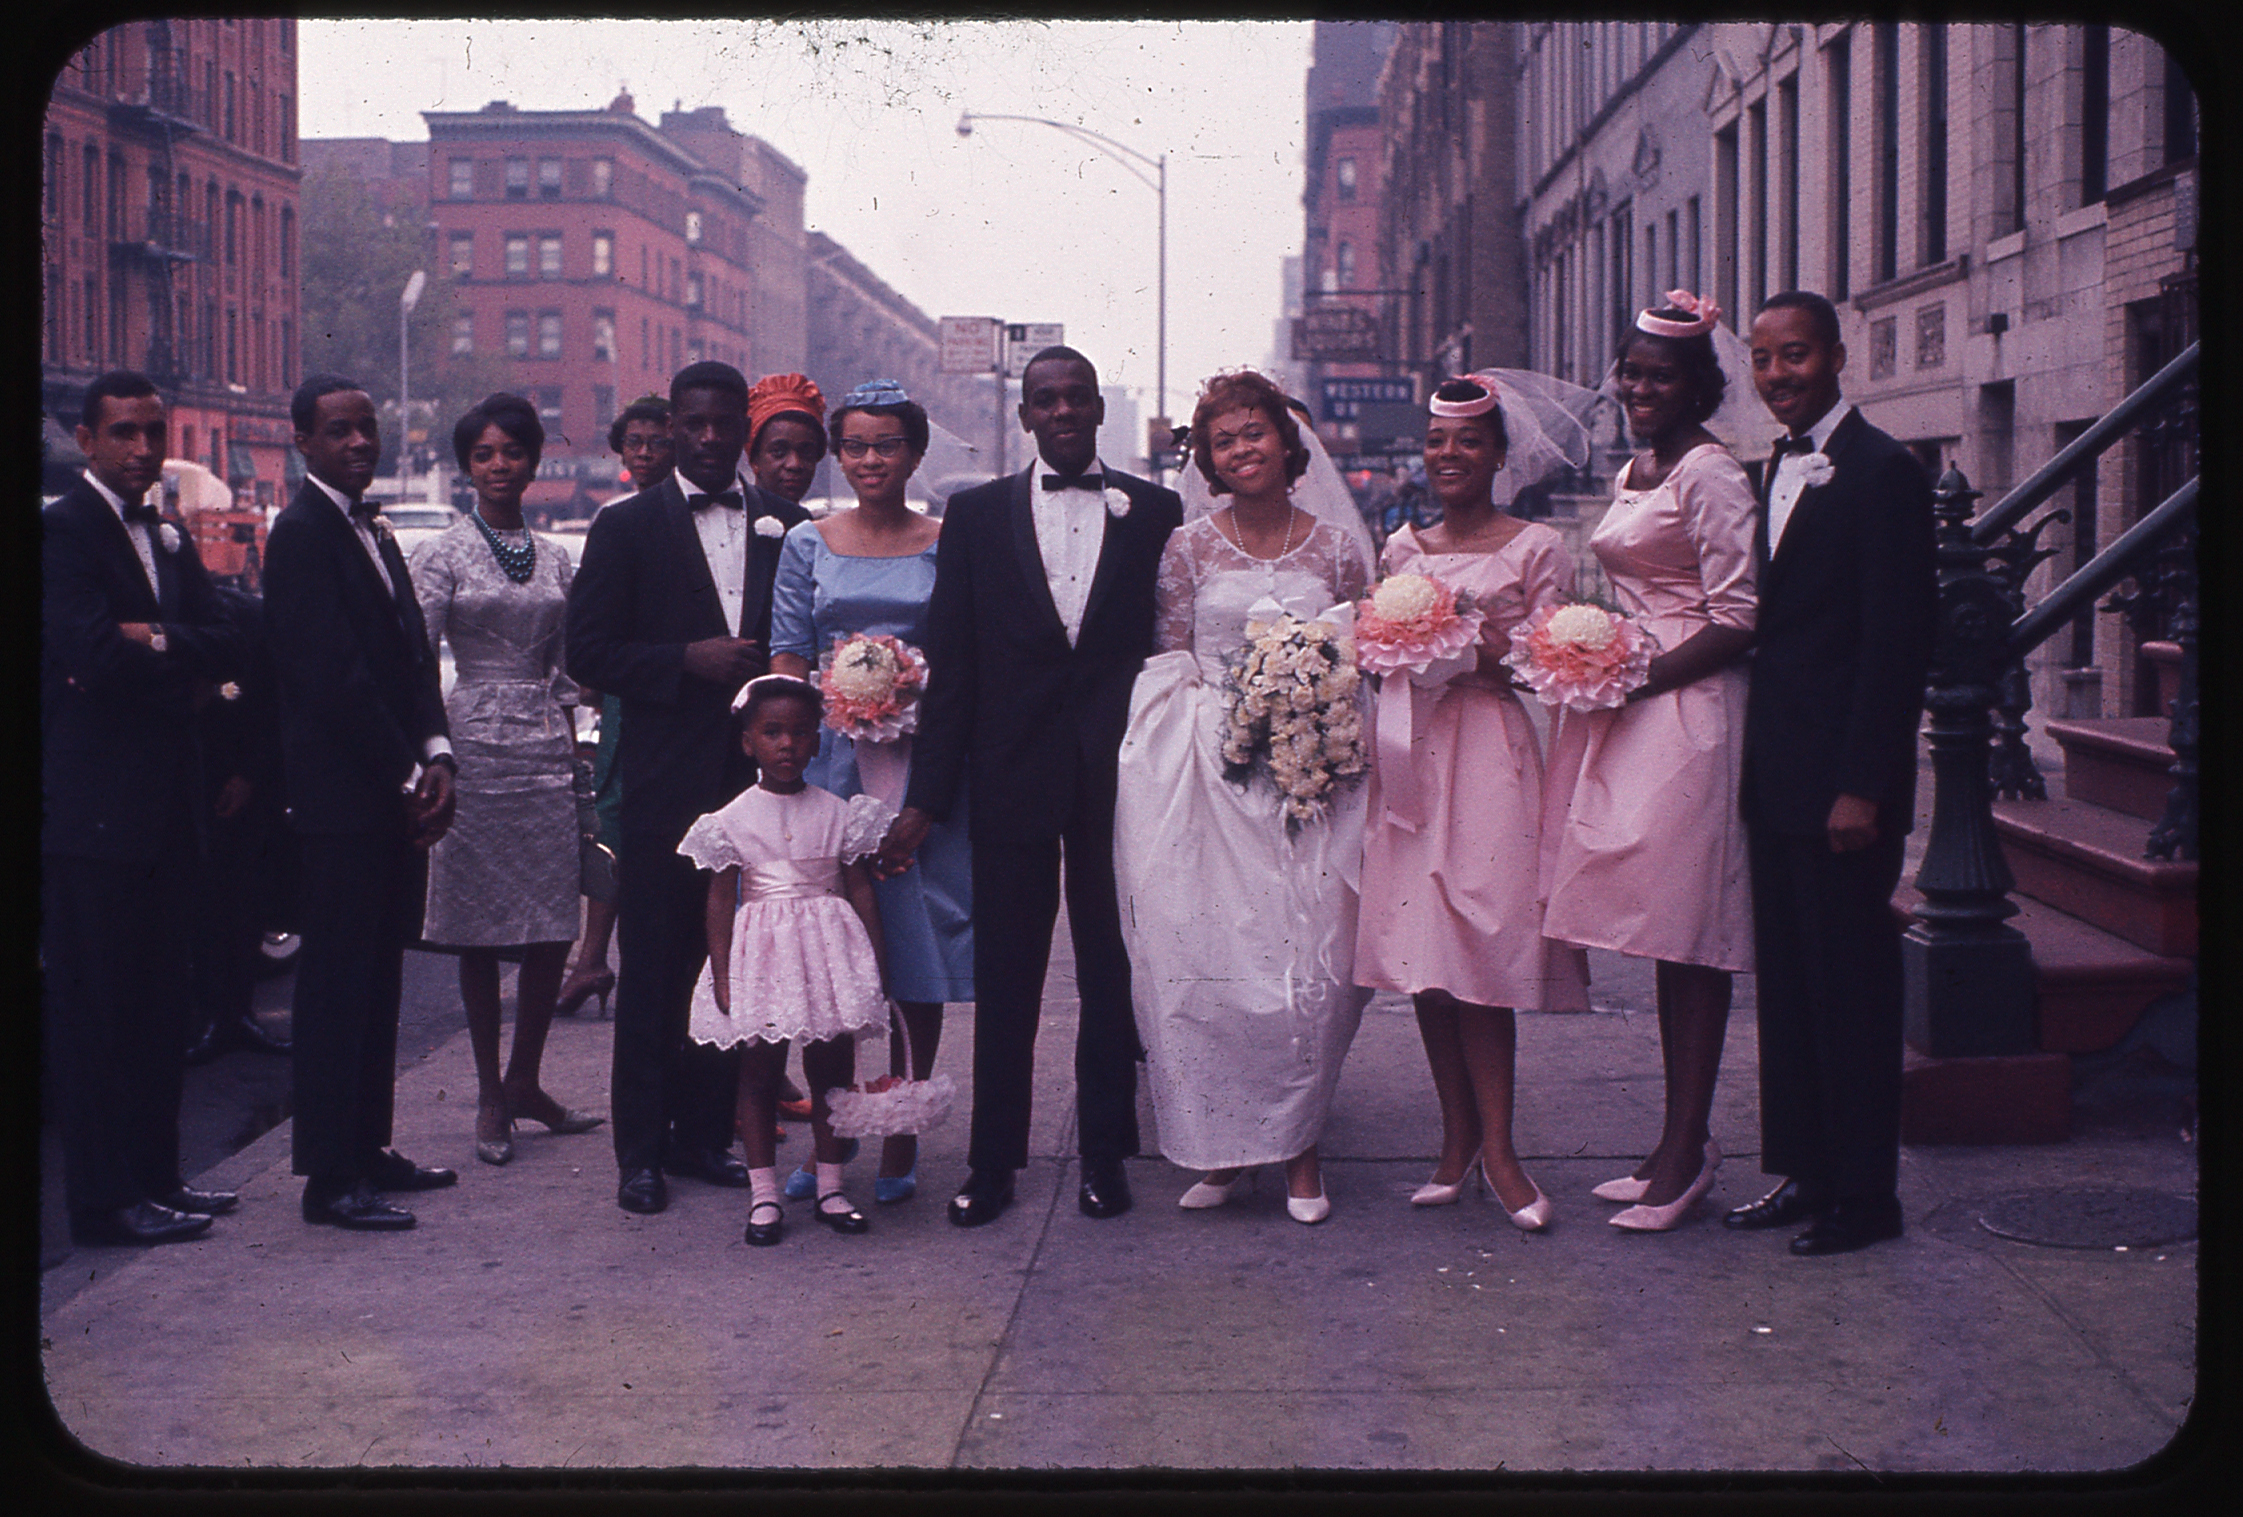 Thomas Allen Harris' parents wedding party on Lenox Avenue, Harlem, USA. Photograph taken by his grandfather Albert Sidney Johnson, c. September 1961